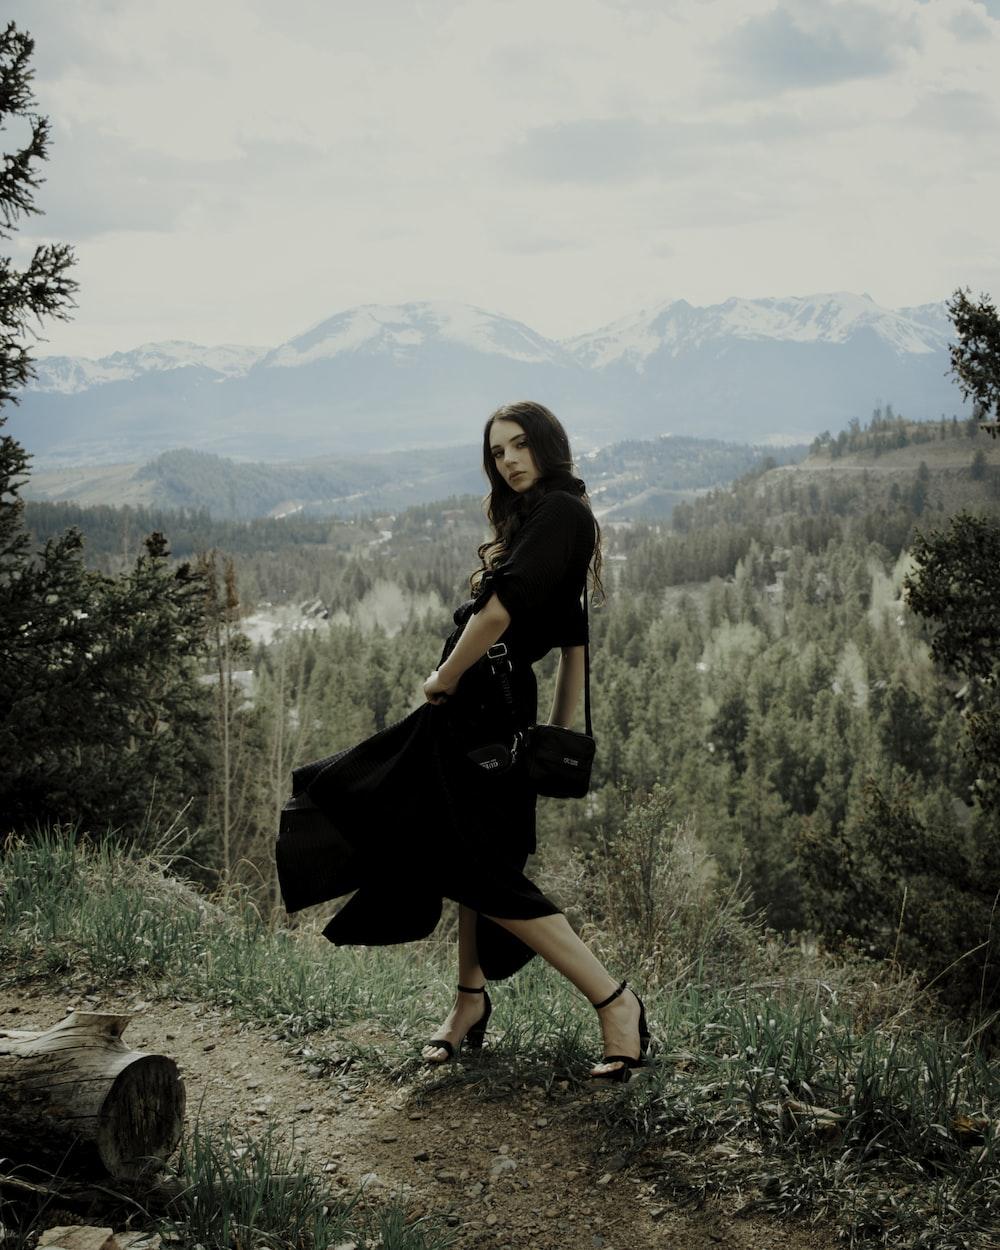 woman in black dress sitting on brown rock during daytime